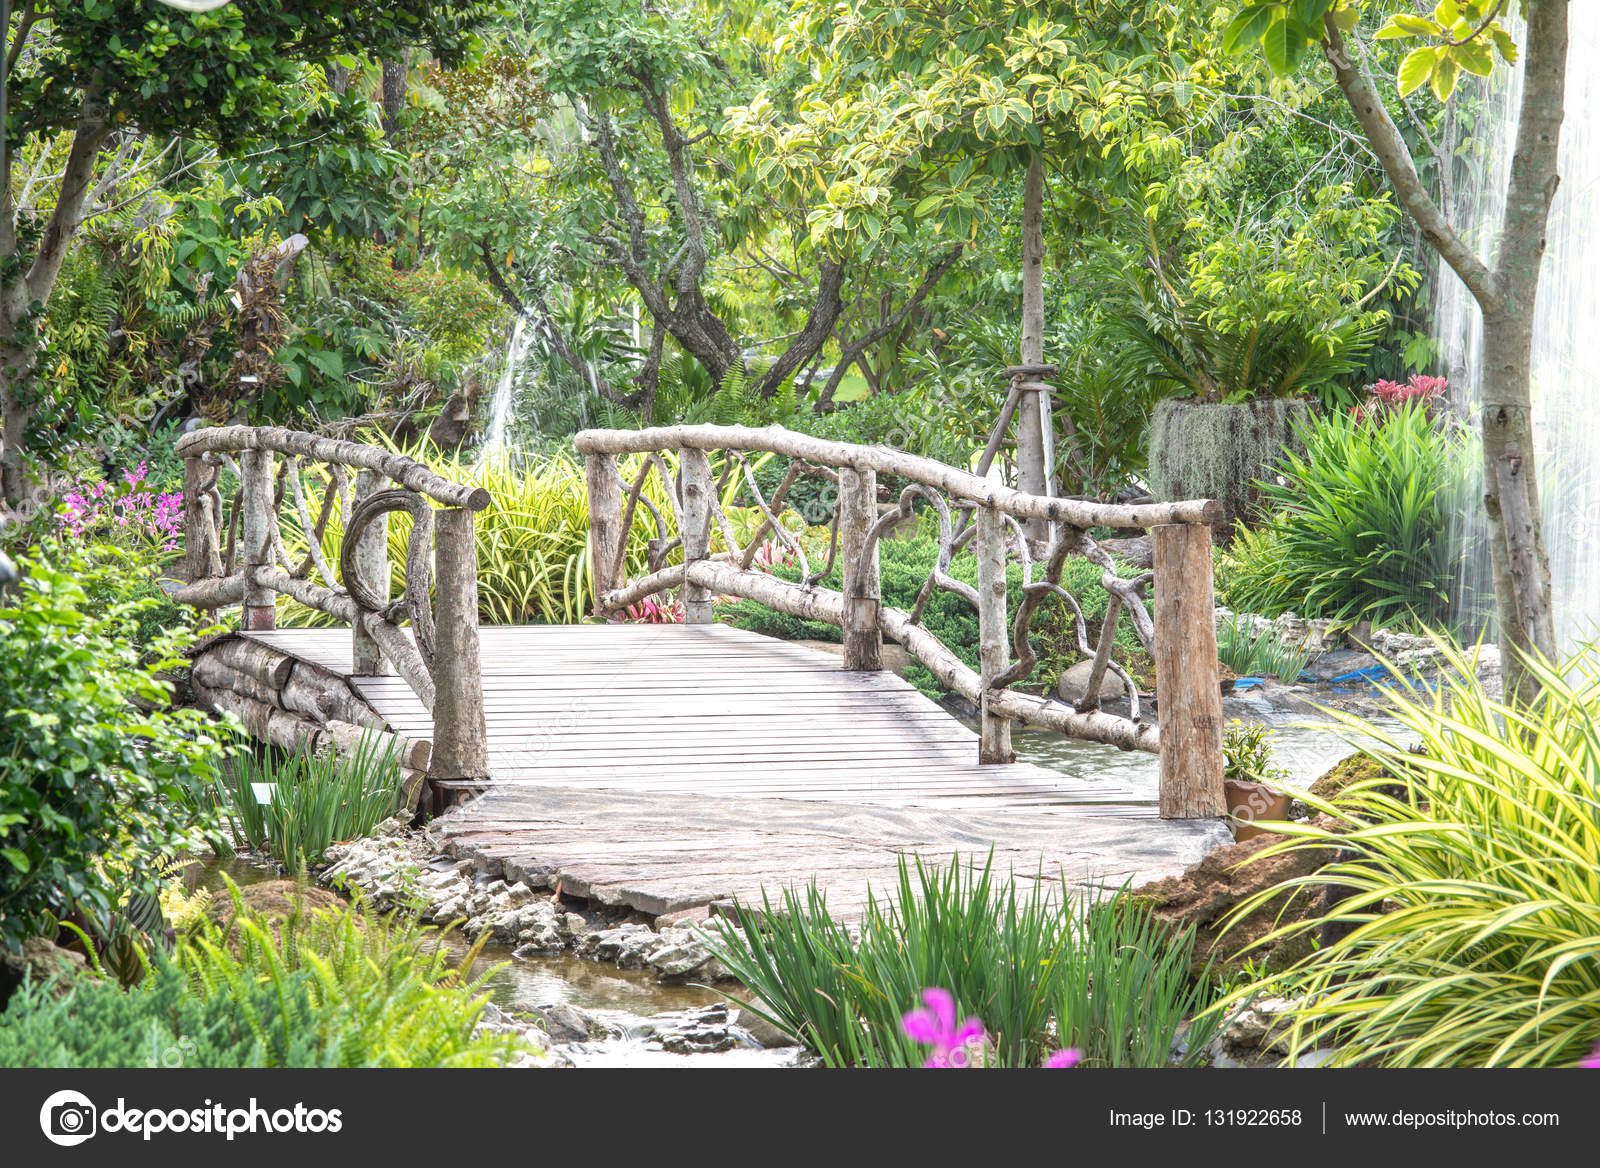 Holzbrücke Im Garten Der Natur Stockfoto Jakkapan 131922658